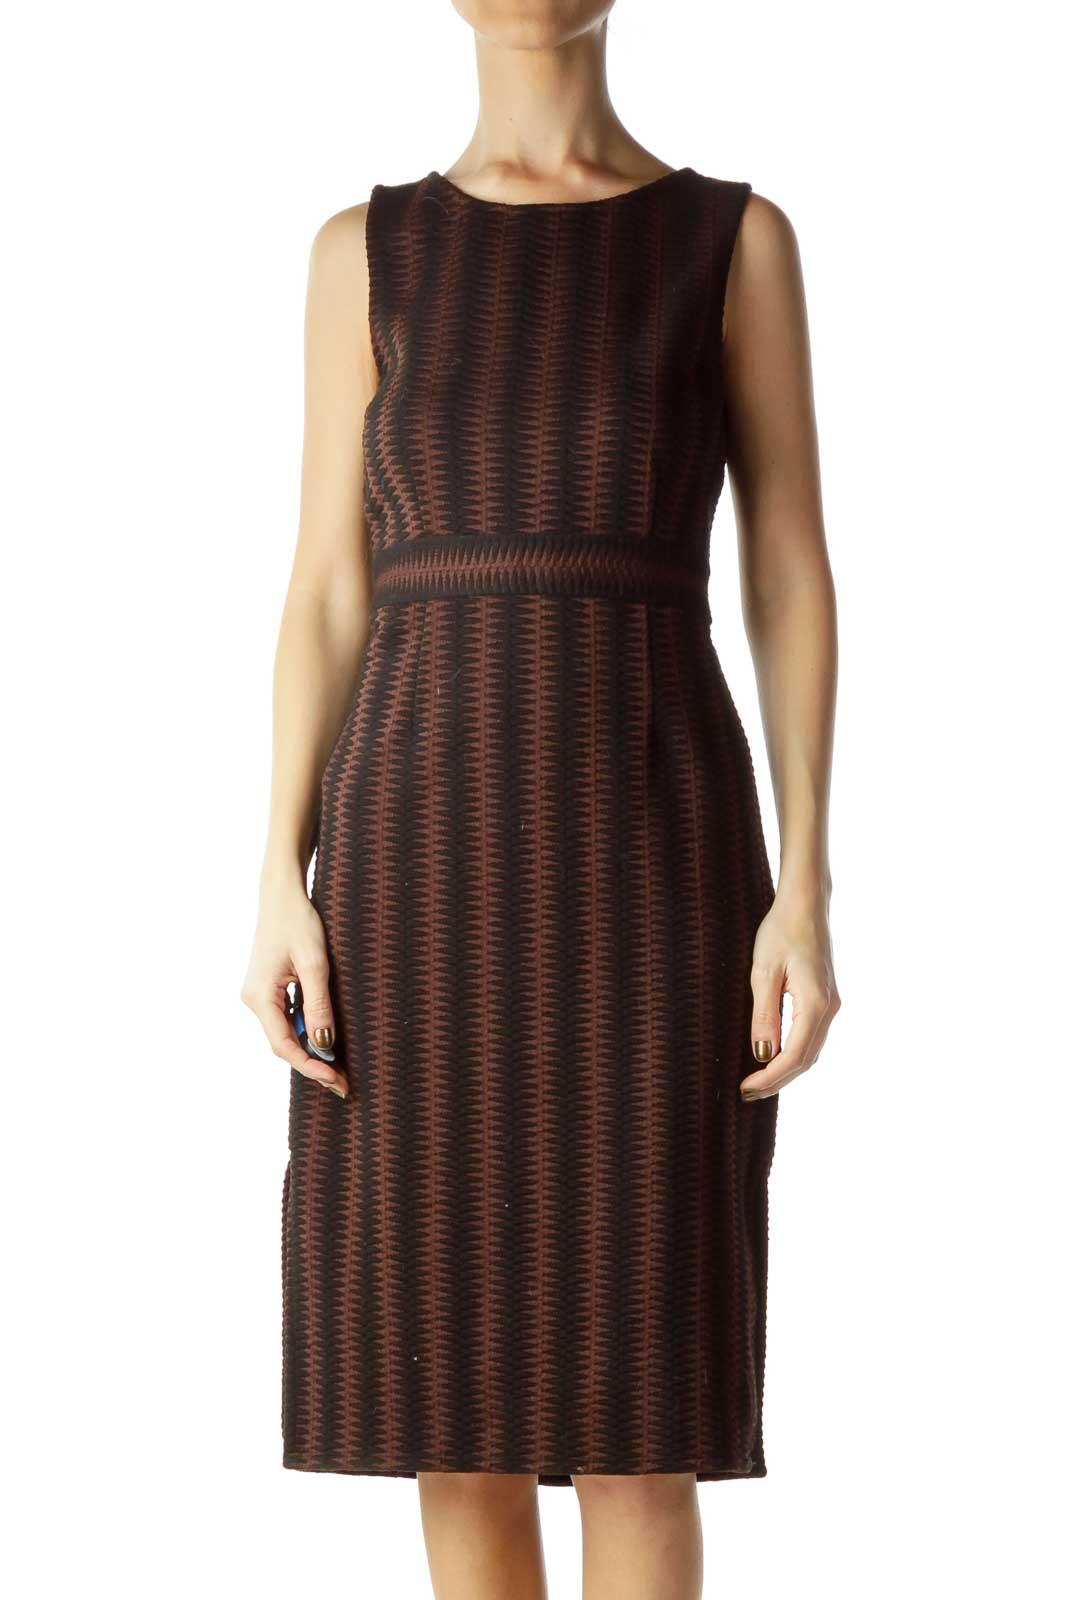 Black Brown Zig-zagged A-Line Work Dress Front